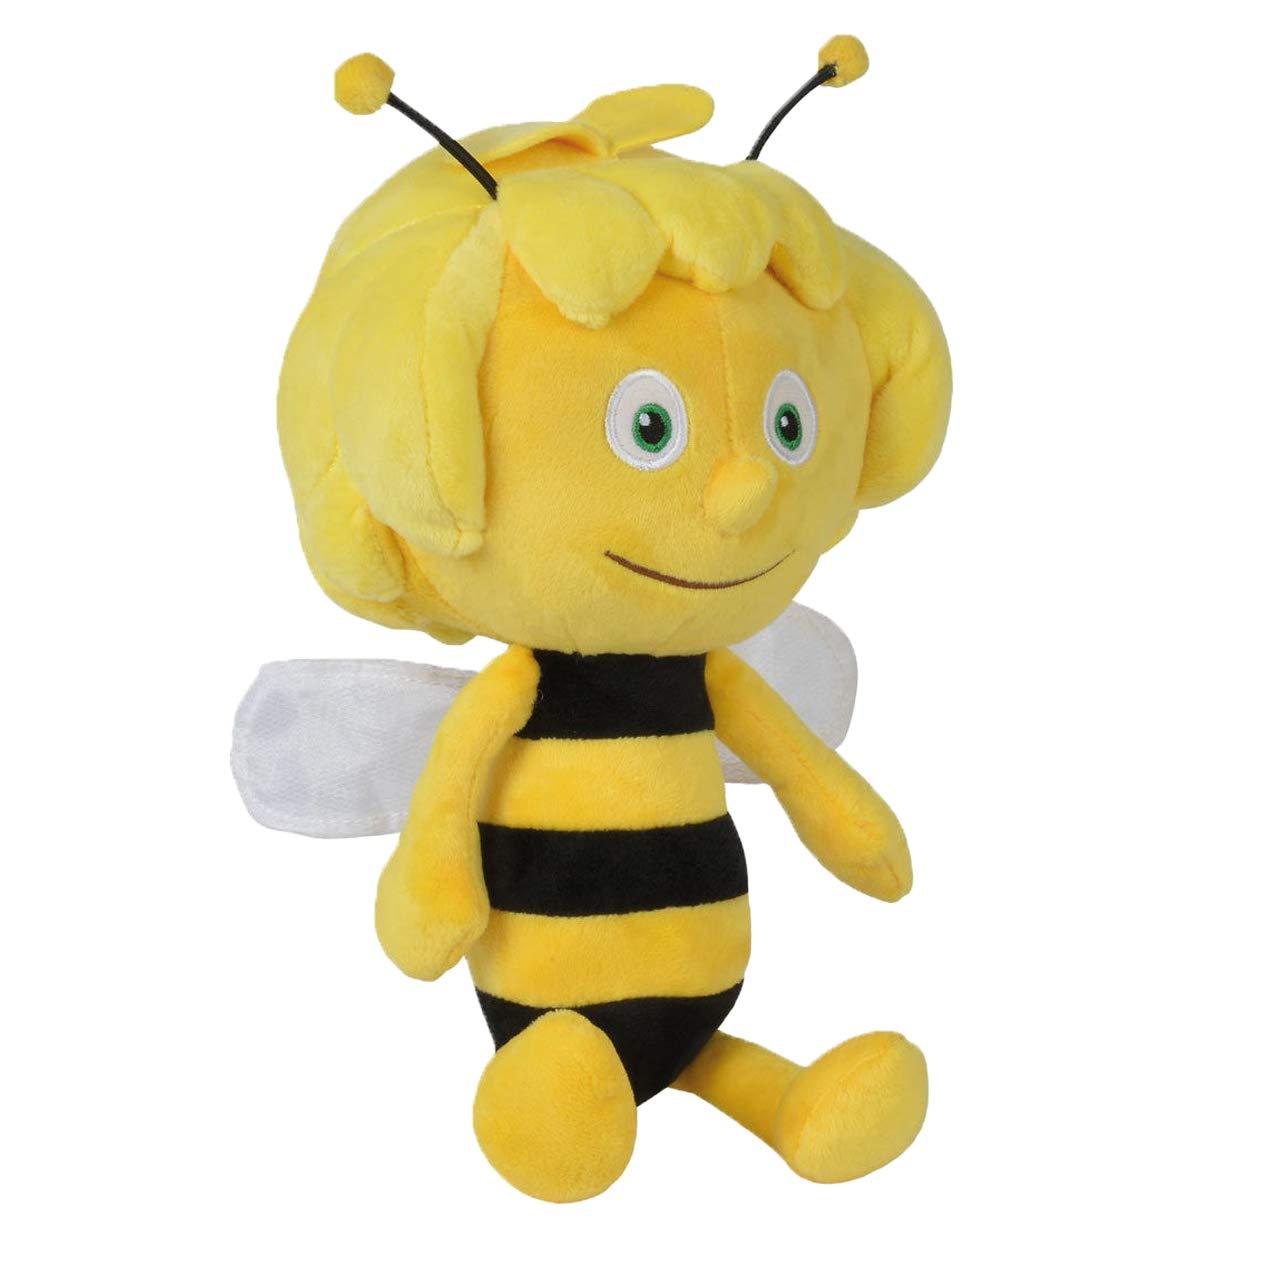 Simba 109341002 - Biene Maja Plüschfigur, 30 cm, gelb Simba Toys Non Books Non Books / Stofftiere